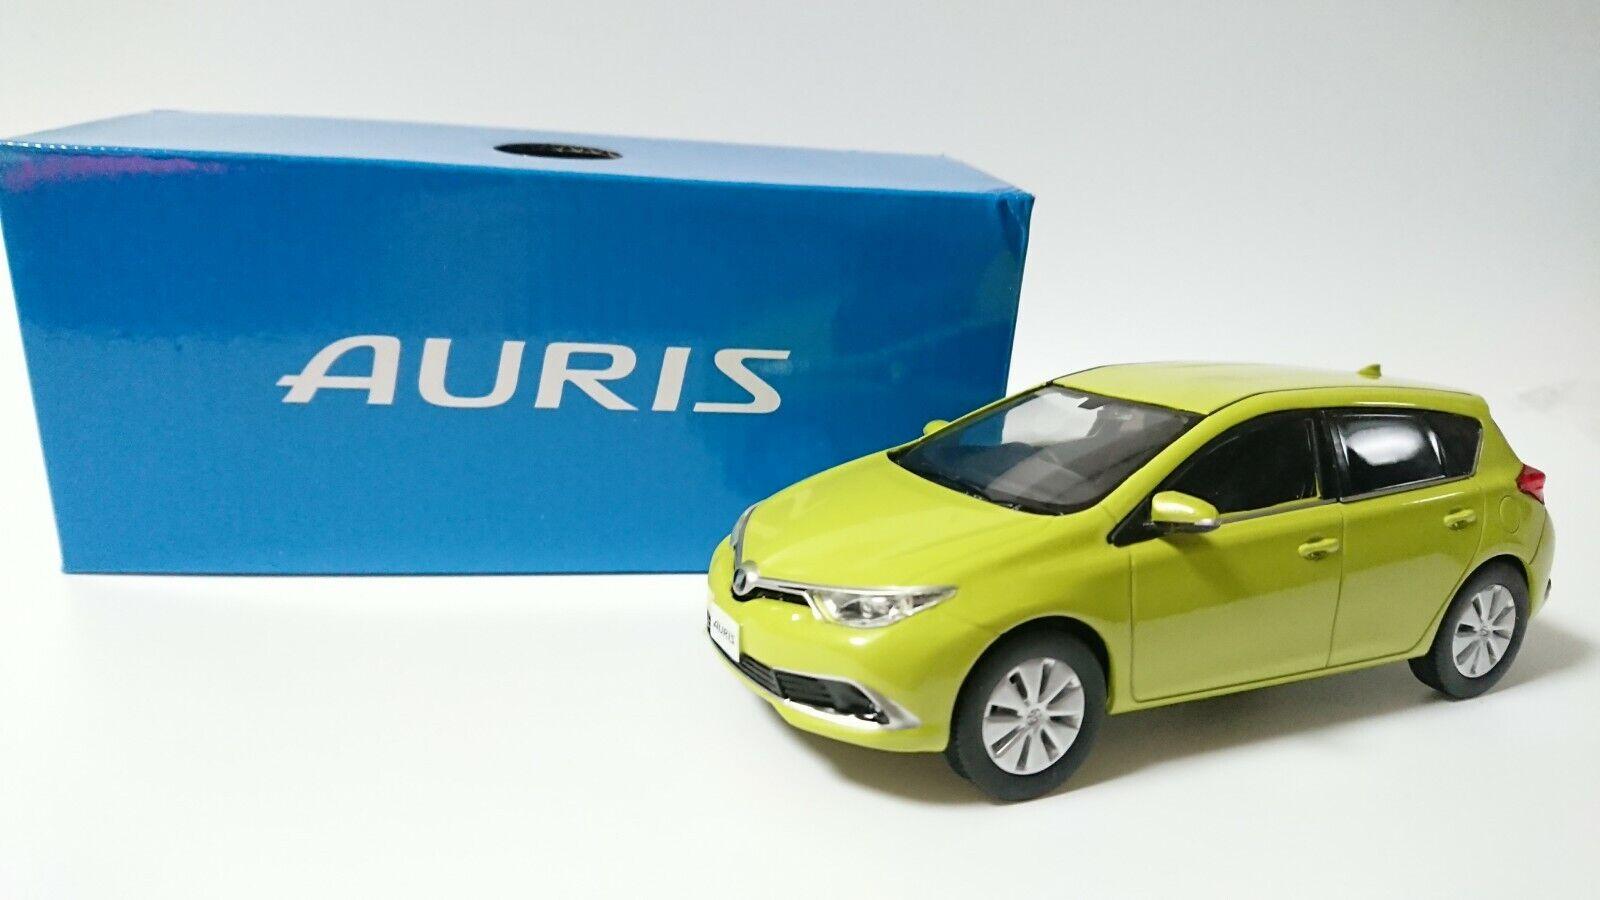 TOYOTA AURIS Storefront Display Items Citrus Mica Metallic Model Car Diecast